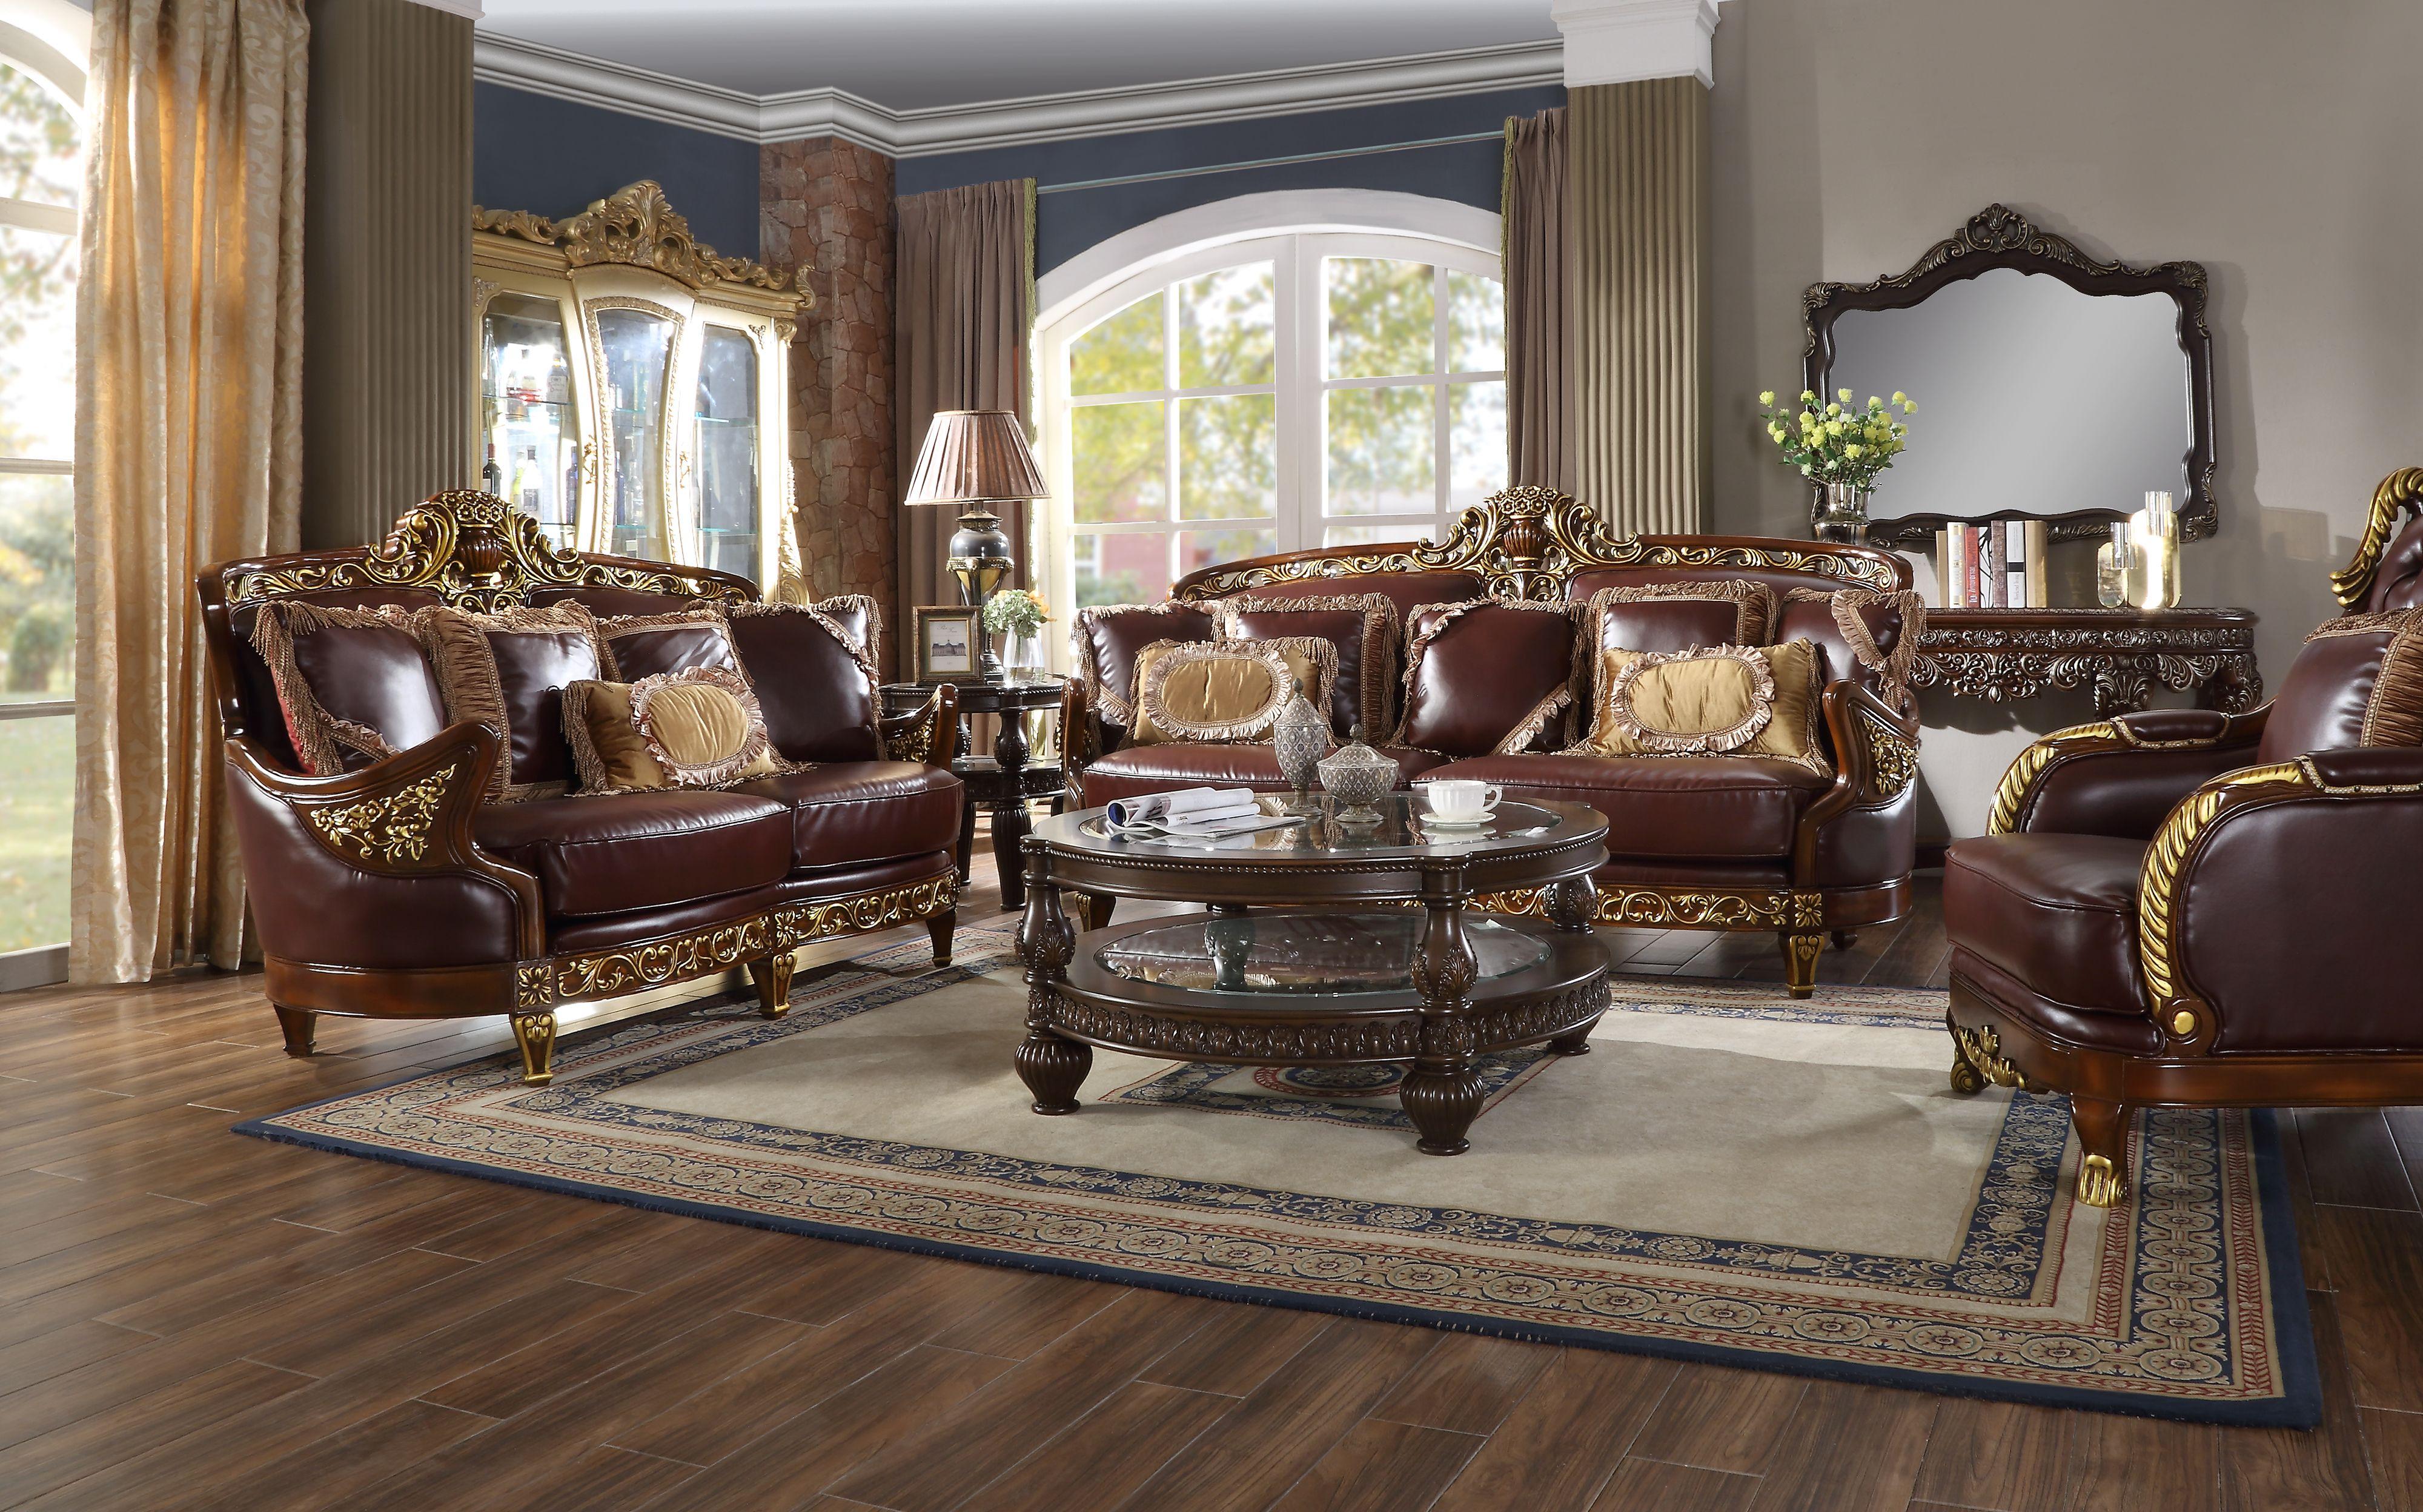 Homey Design Hd 89 3pc Sofa Set Mahogany Gold Finish Luxury Furniture In 2020 Luxury Furniture Living Room Stands Sofa Set